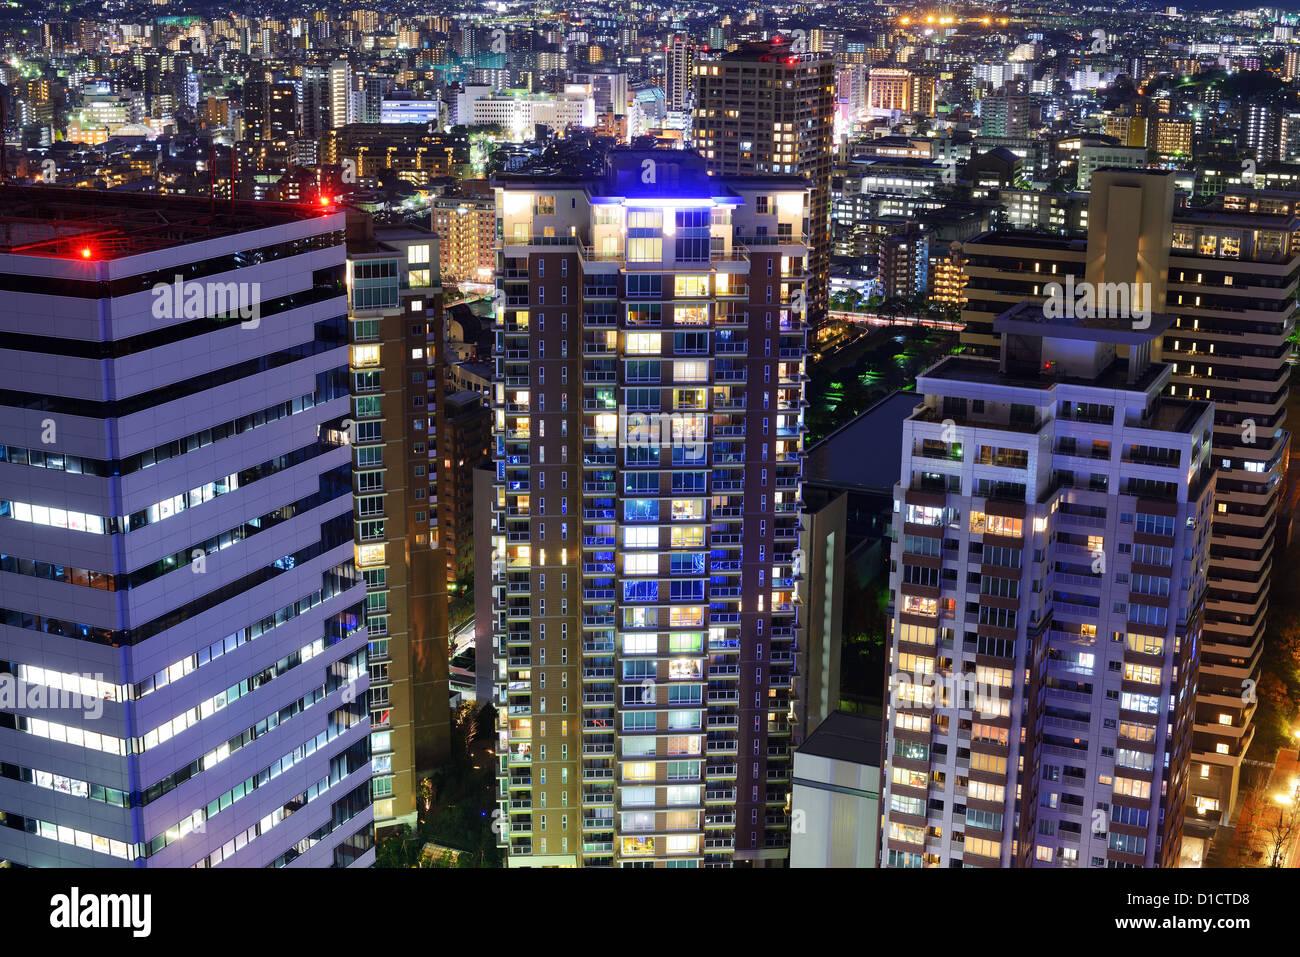 Cityscape of Fukuoka, Japan. - Stock Image